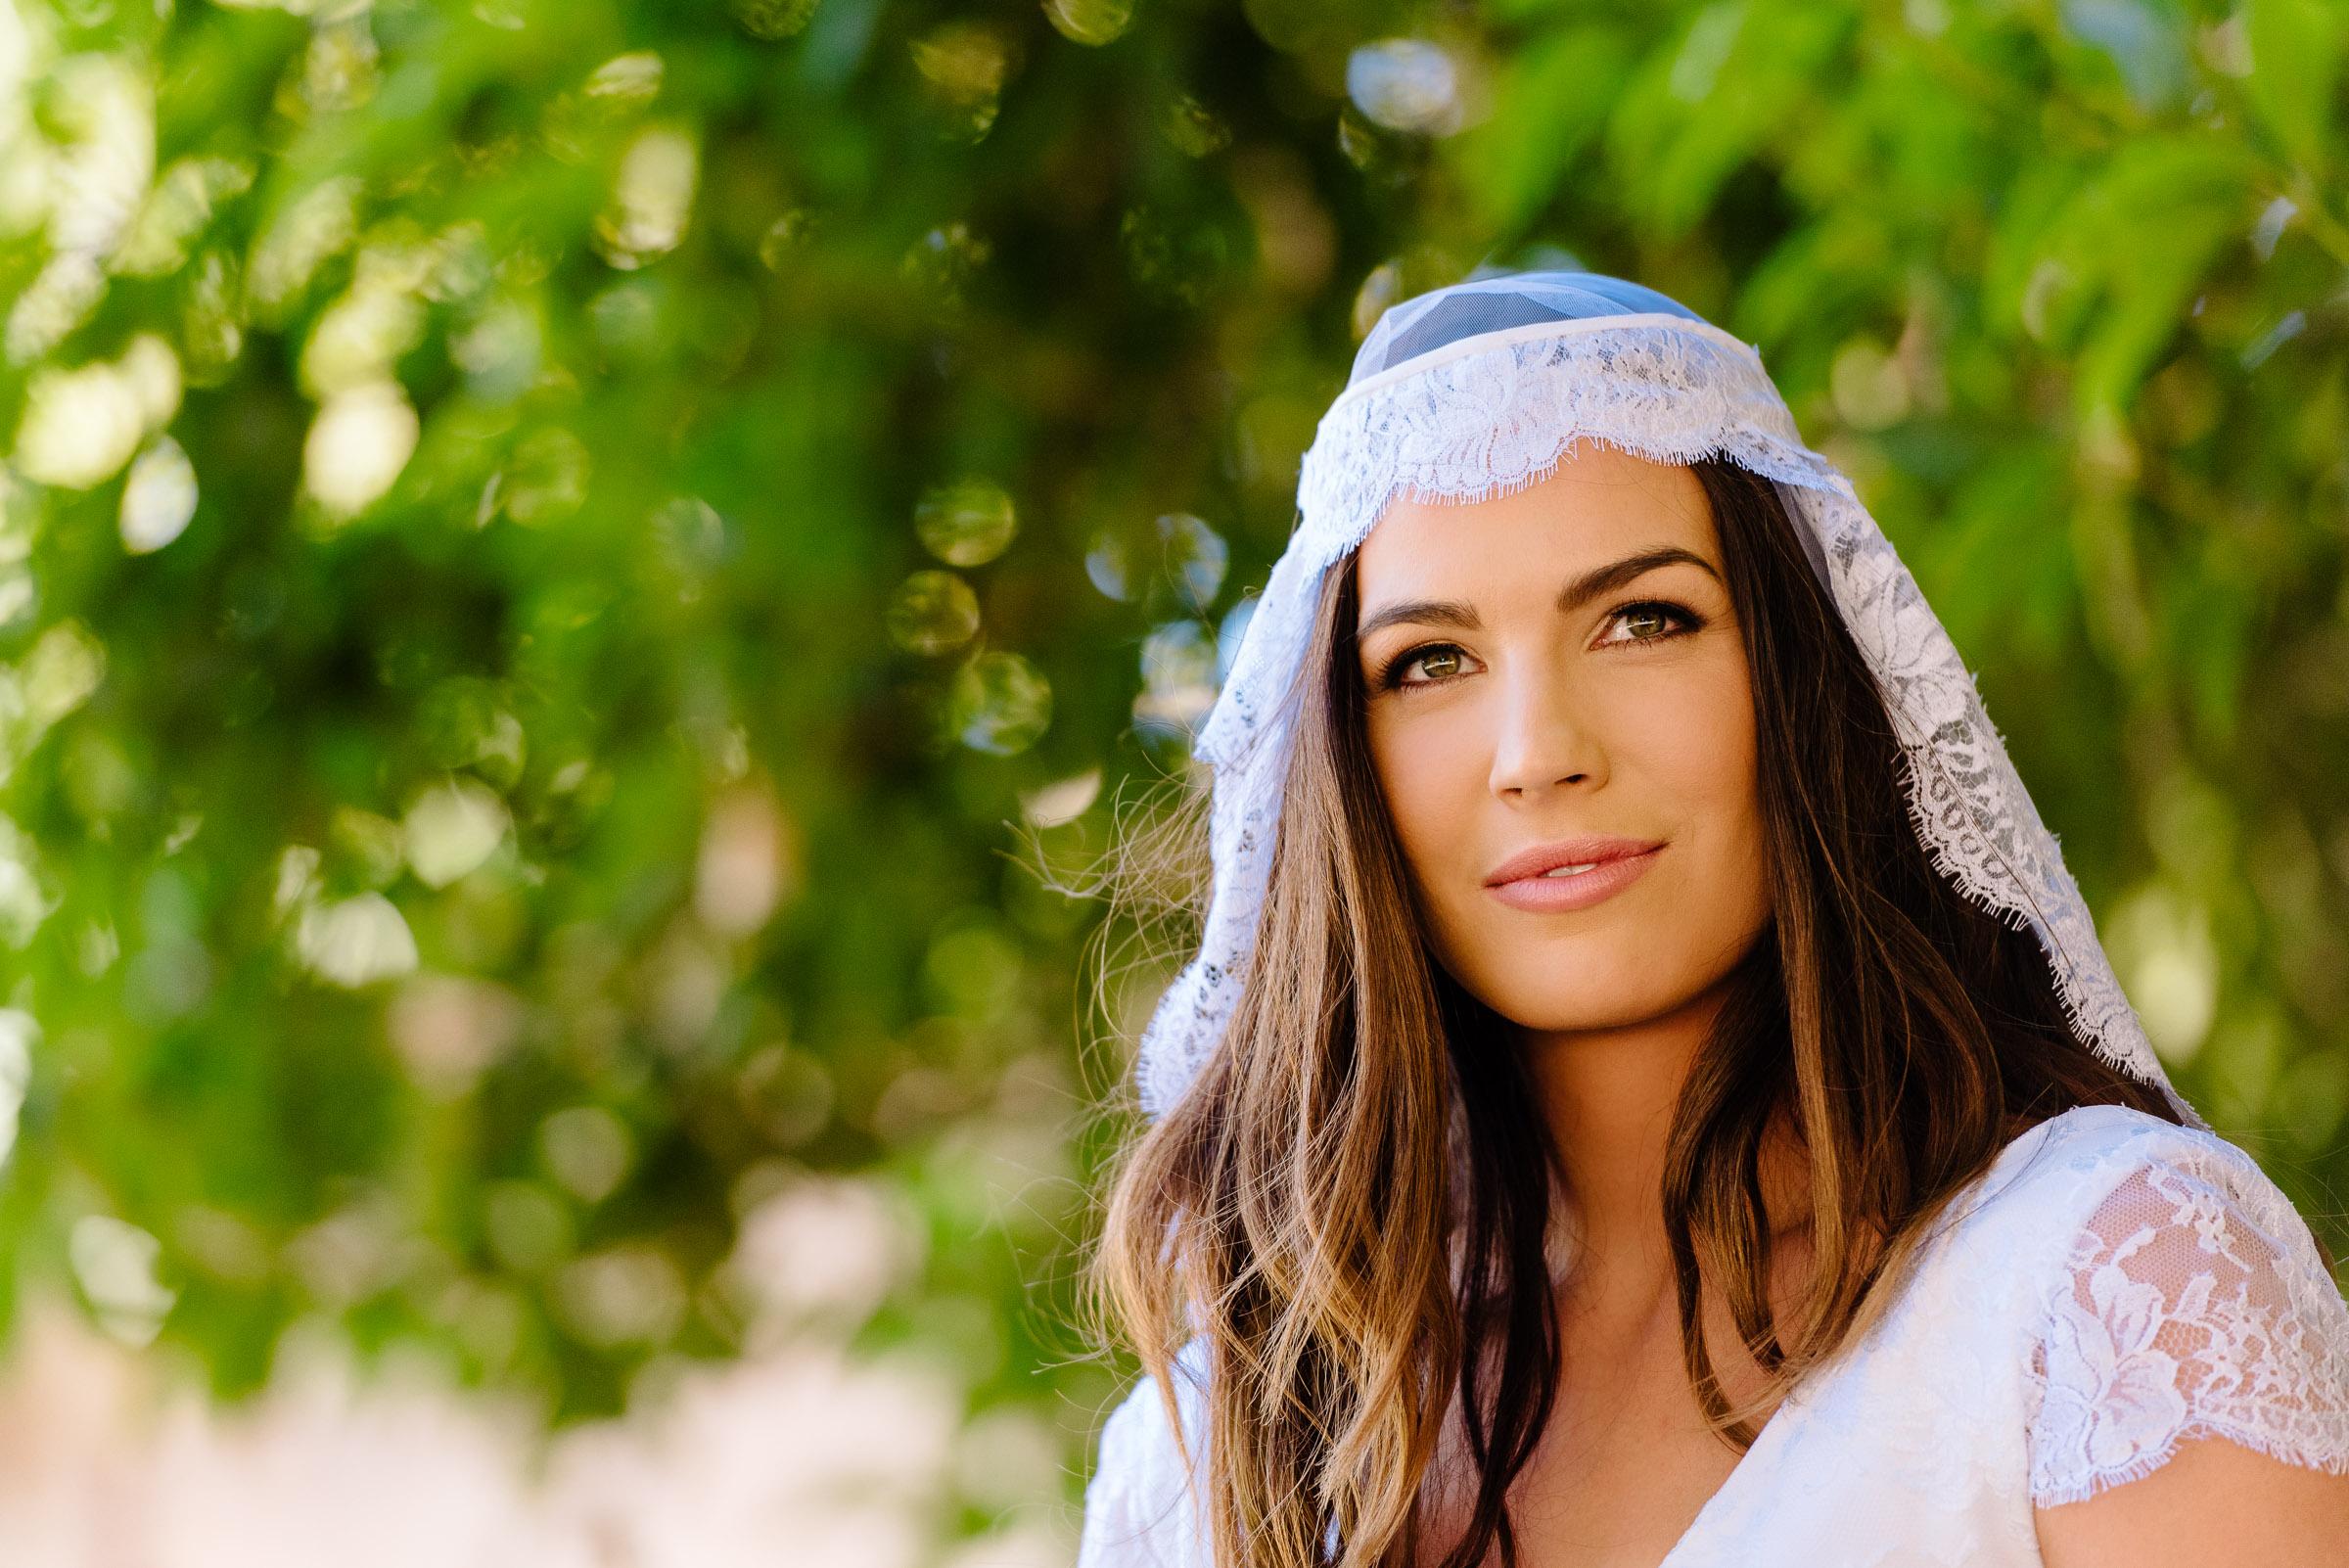 Carly the beautiful bohemian bride at her Chateau Dore wedding in Bendigo